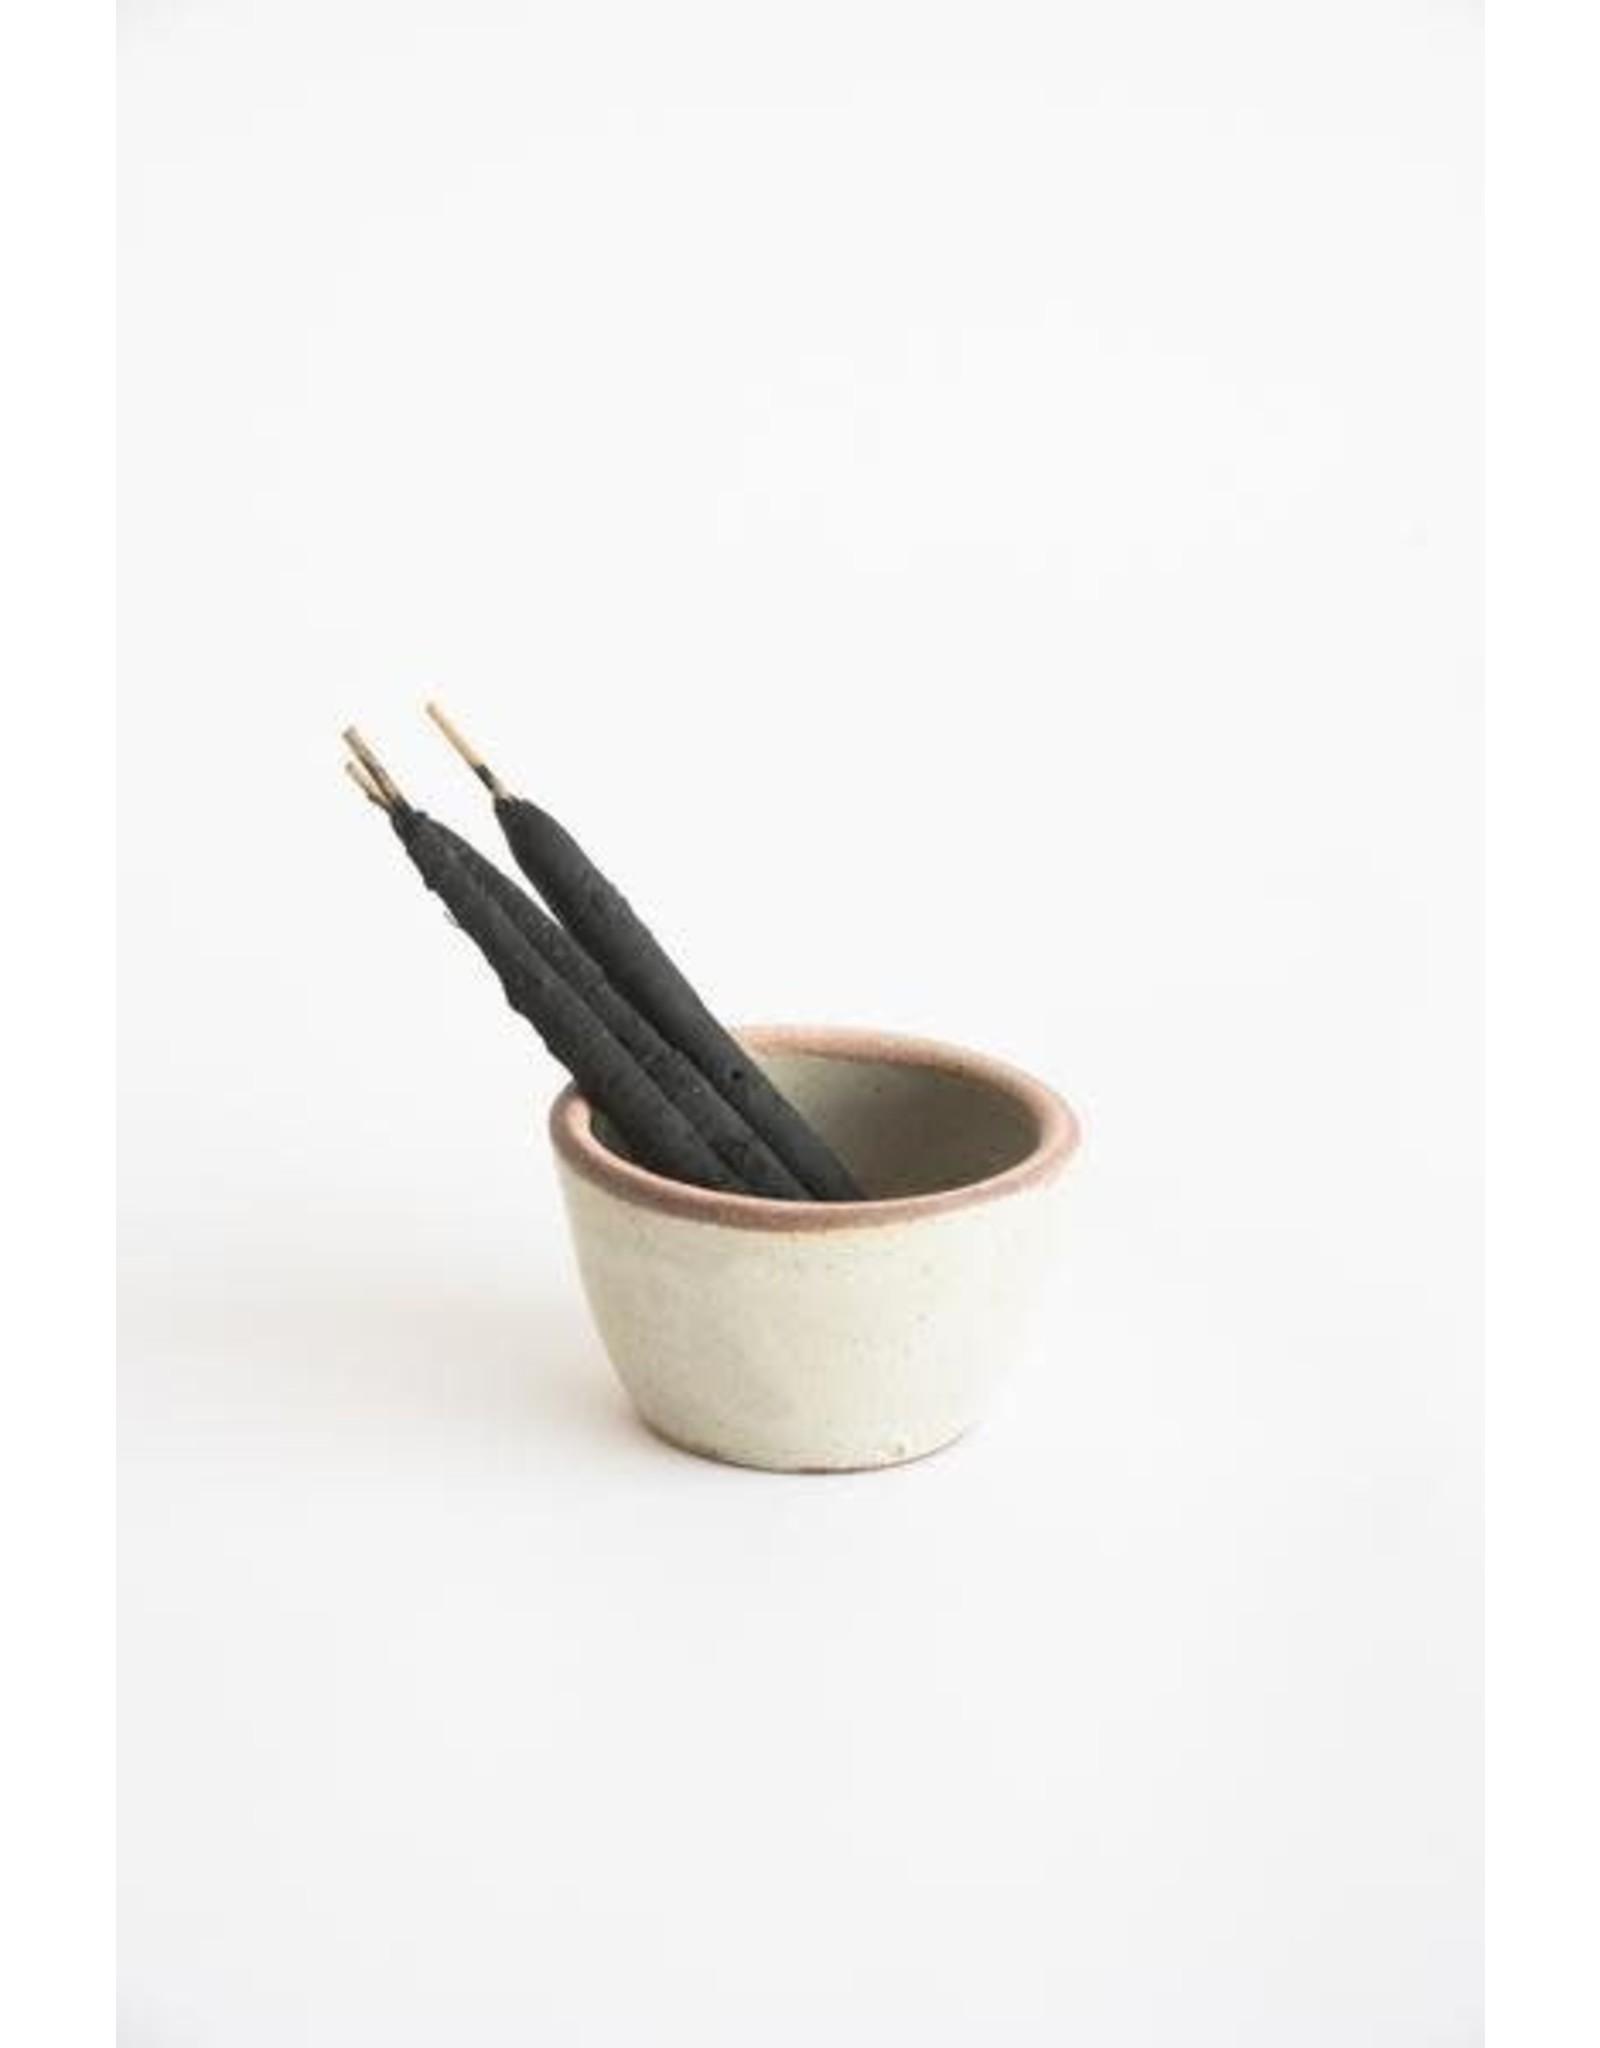 Incausa Stoneware Smudge Bowl - Piker White